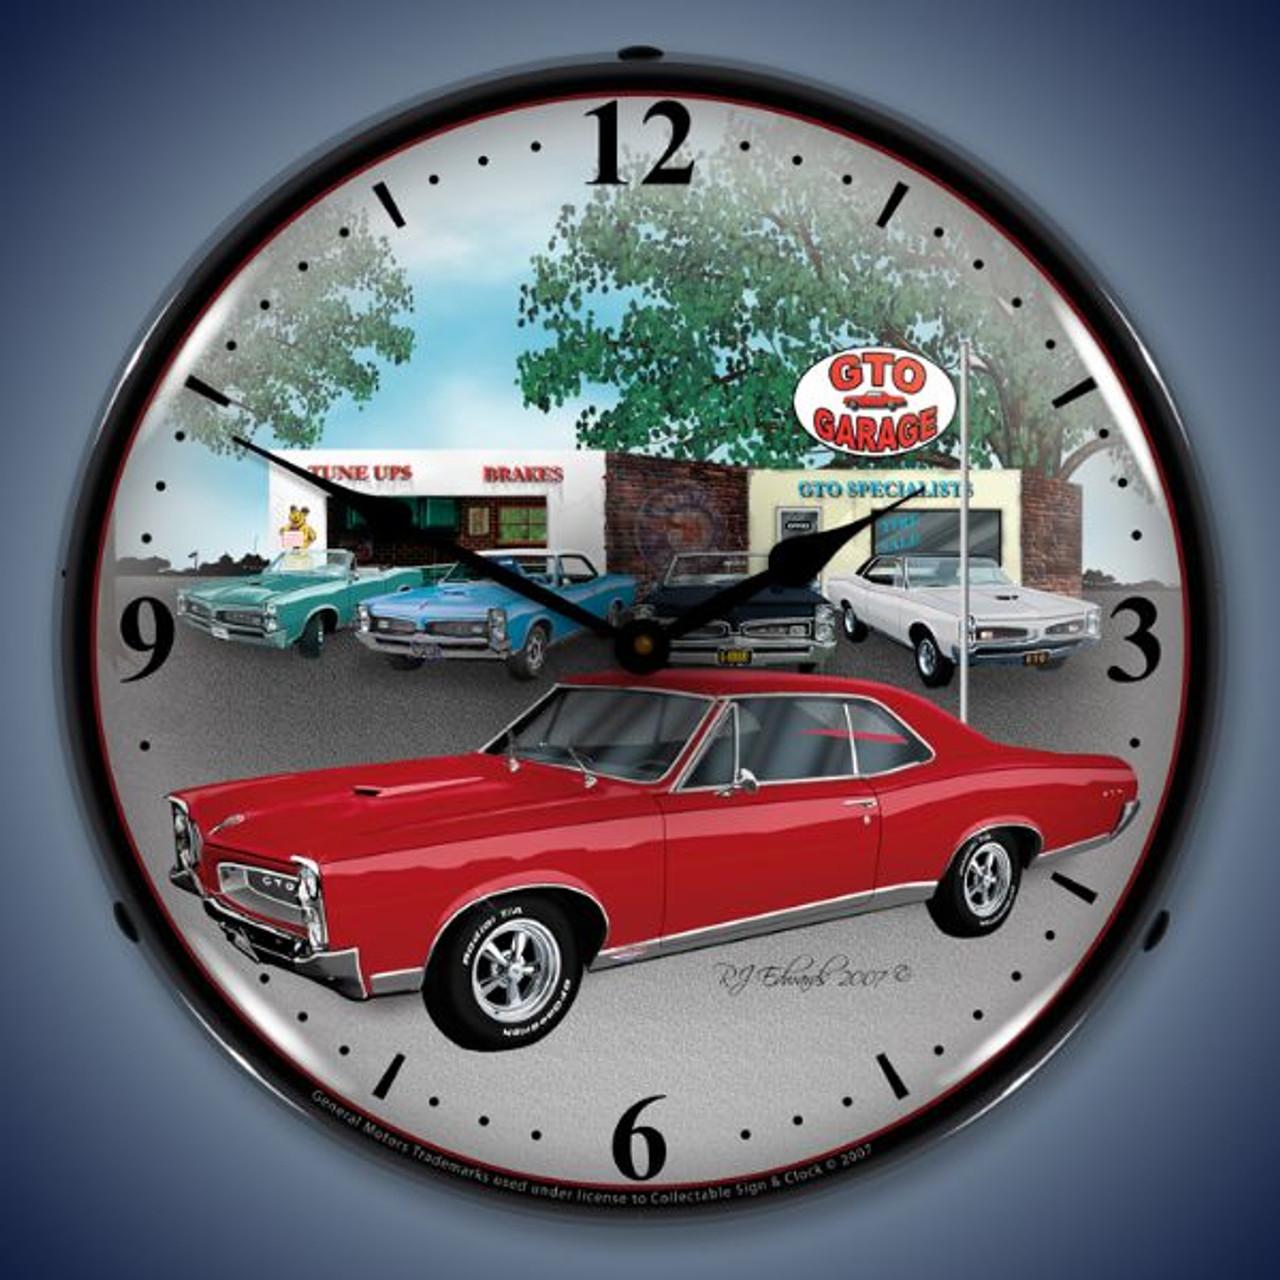 Retro  1967 GTO Lighted Wall Clock 14 x 14 Inches